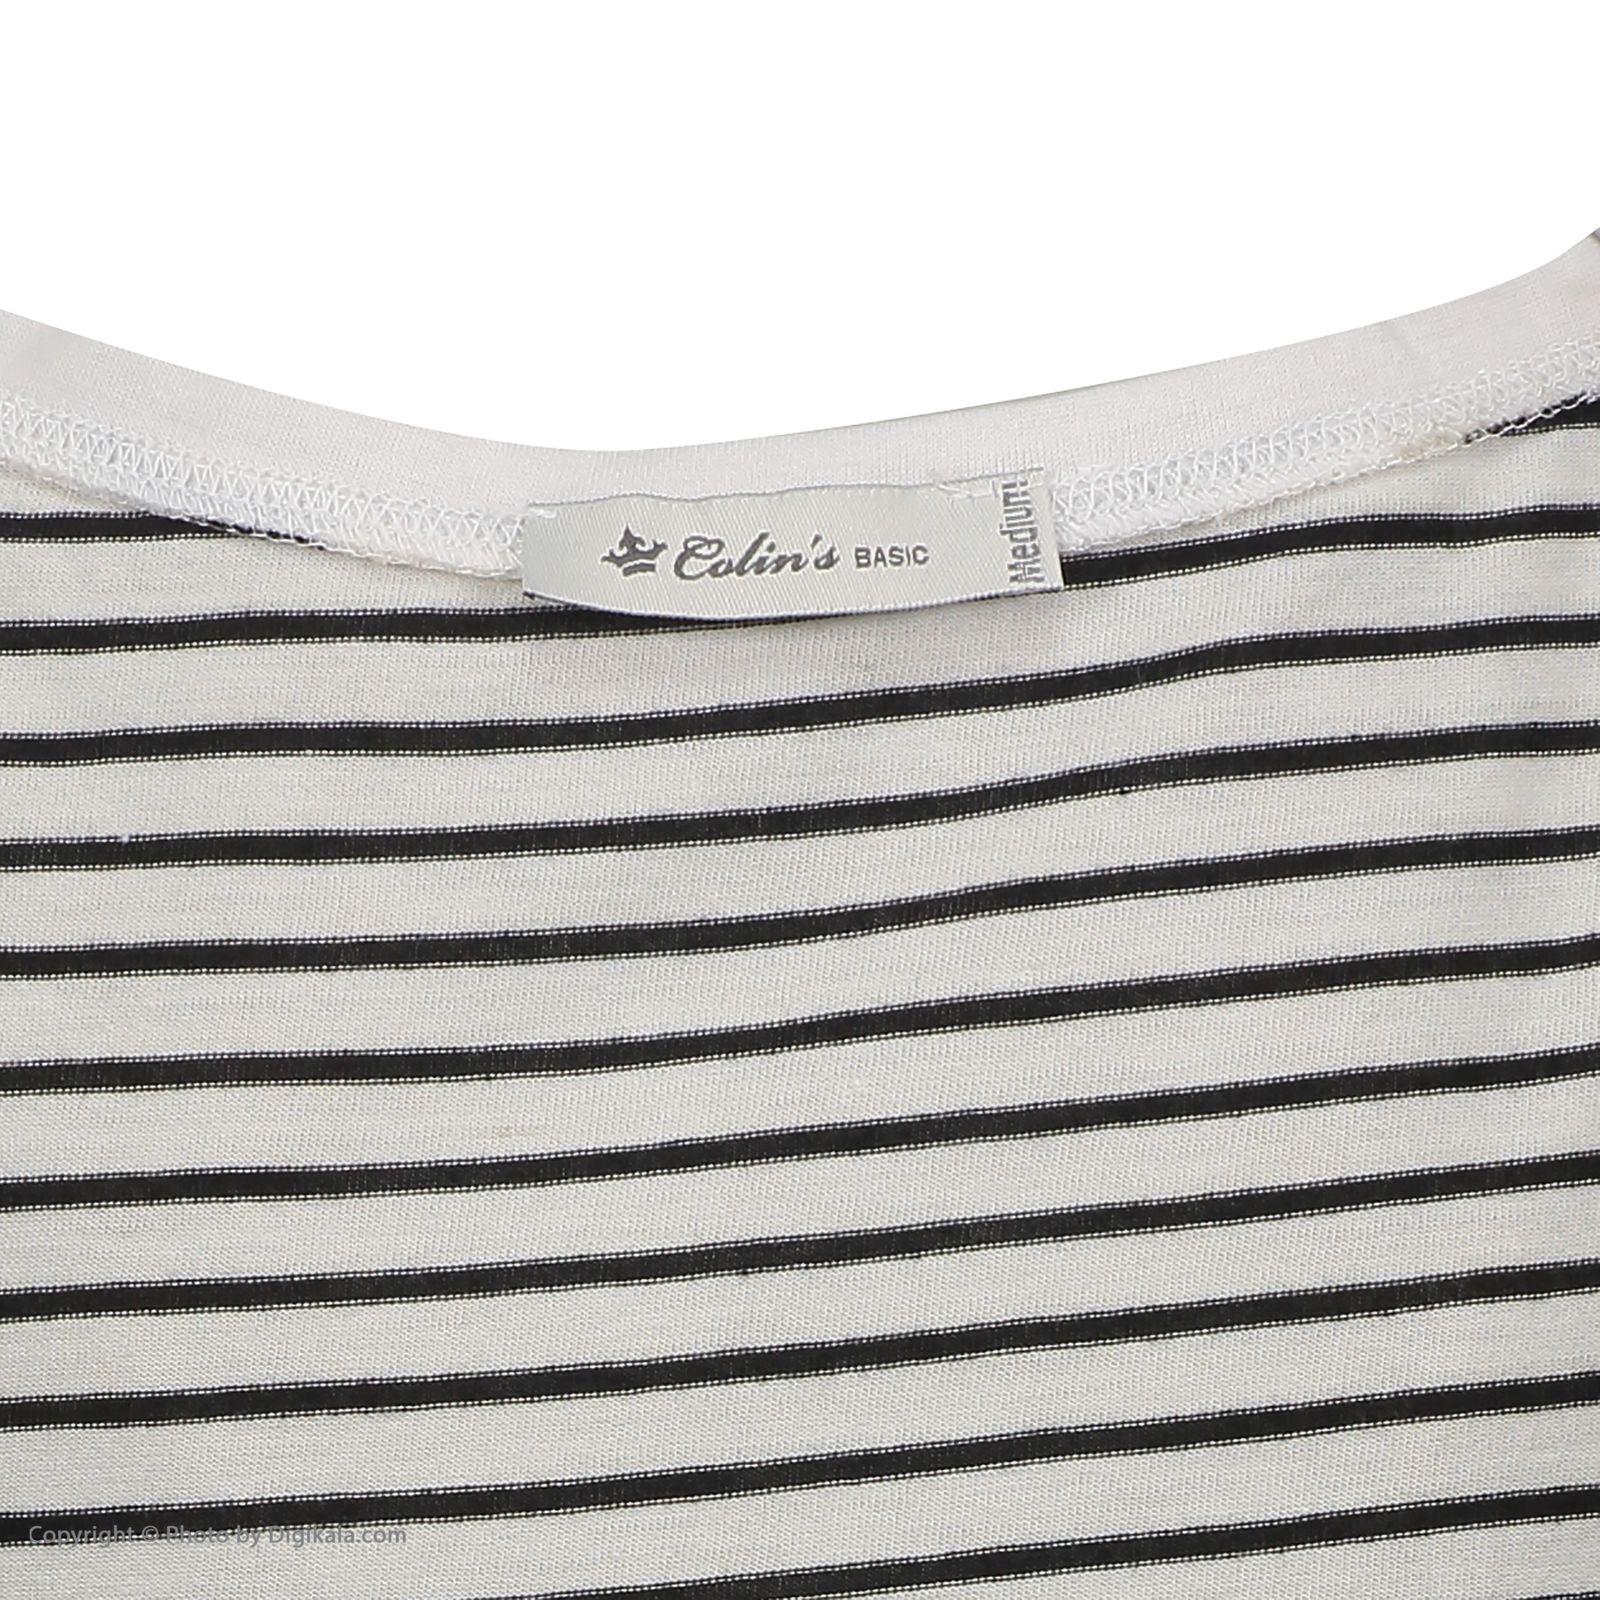 تی شرت زنانه کالینز مدل CL1020423-WHITE main 1 5